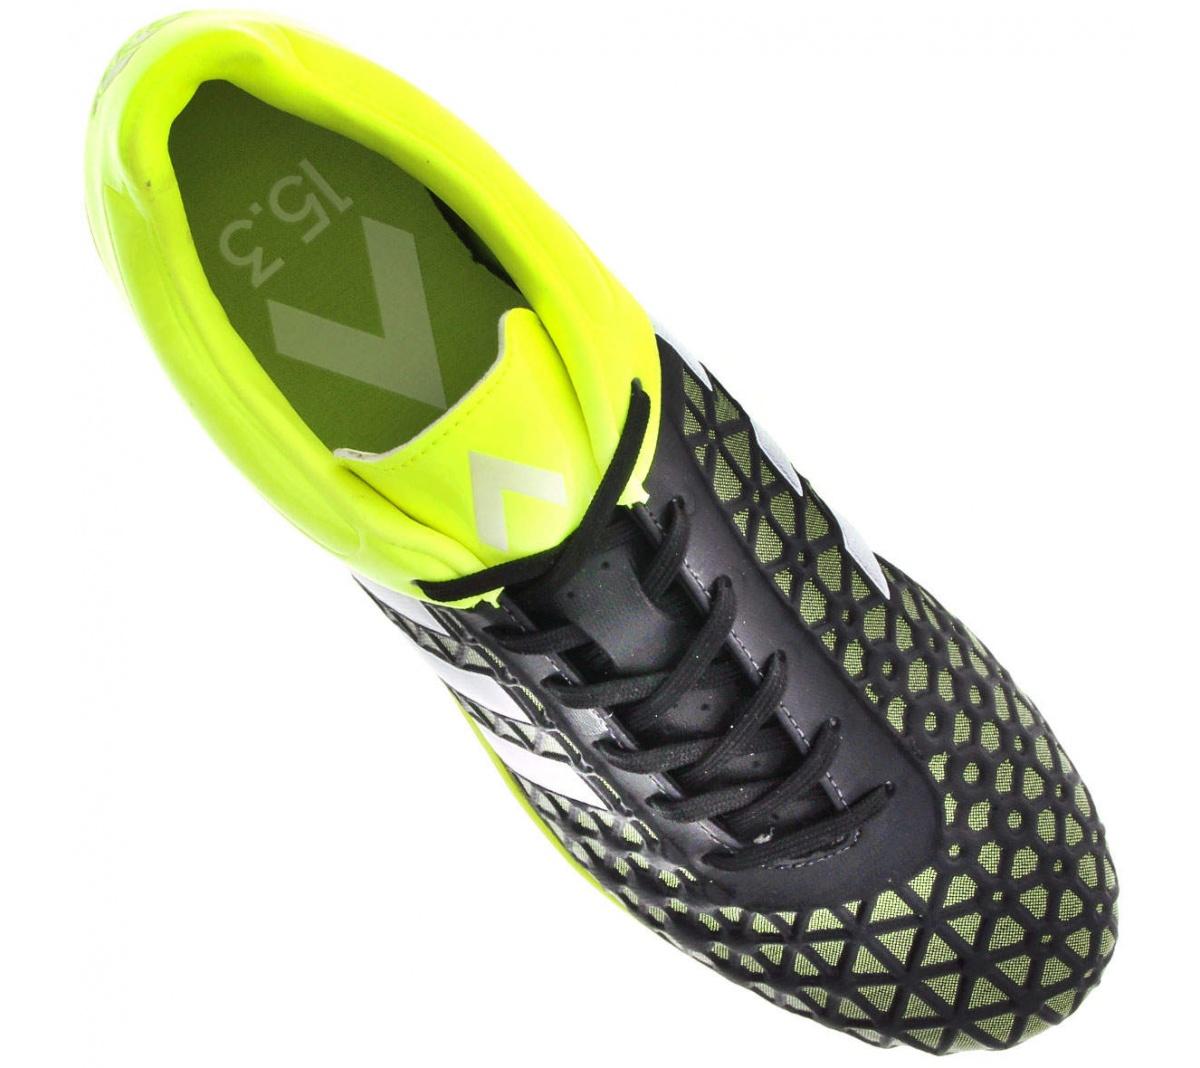 73ccbb003b Tenis Adidas Ace 15.3 Futsal - Mundo do Futebol